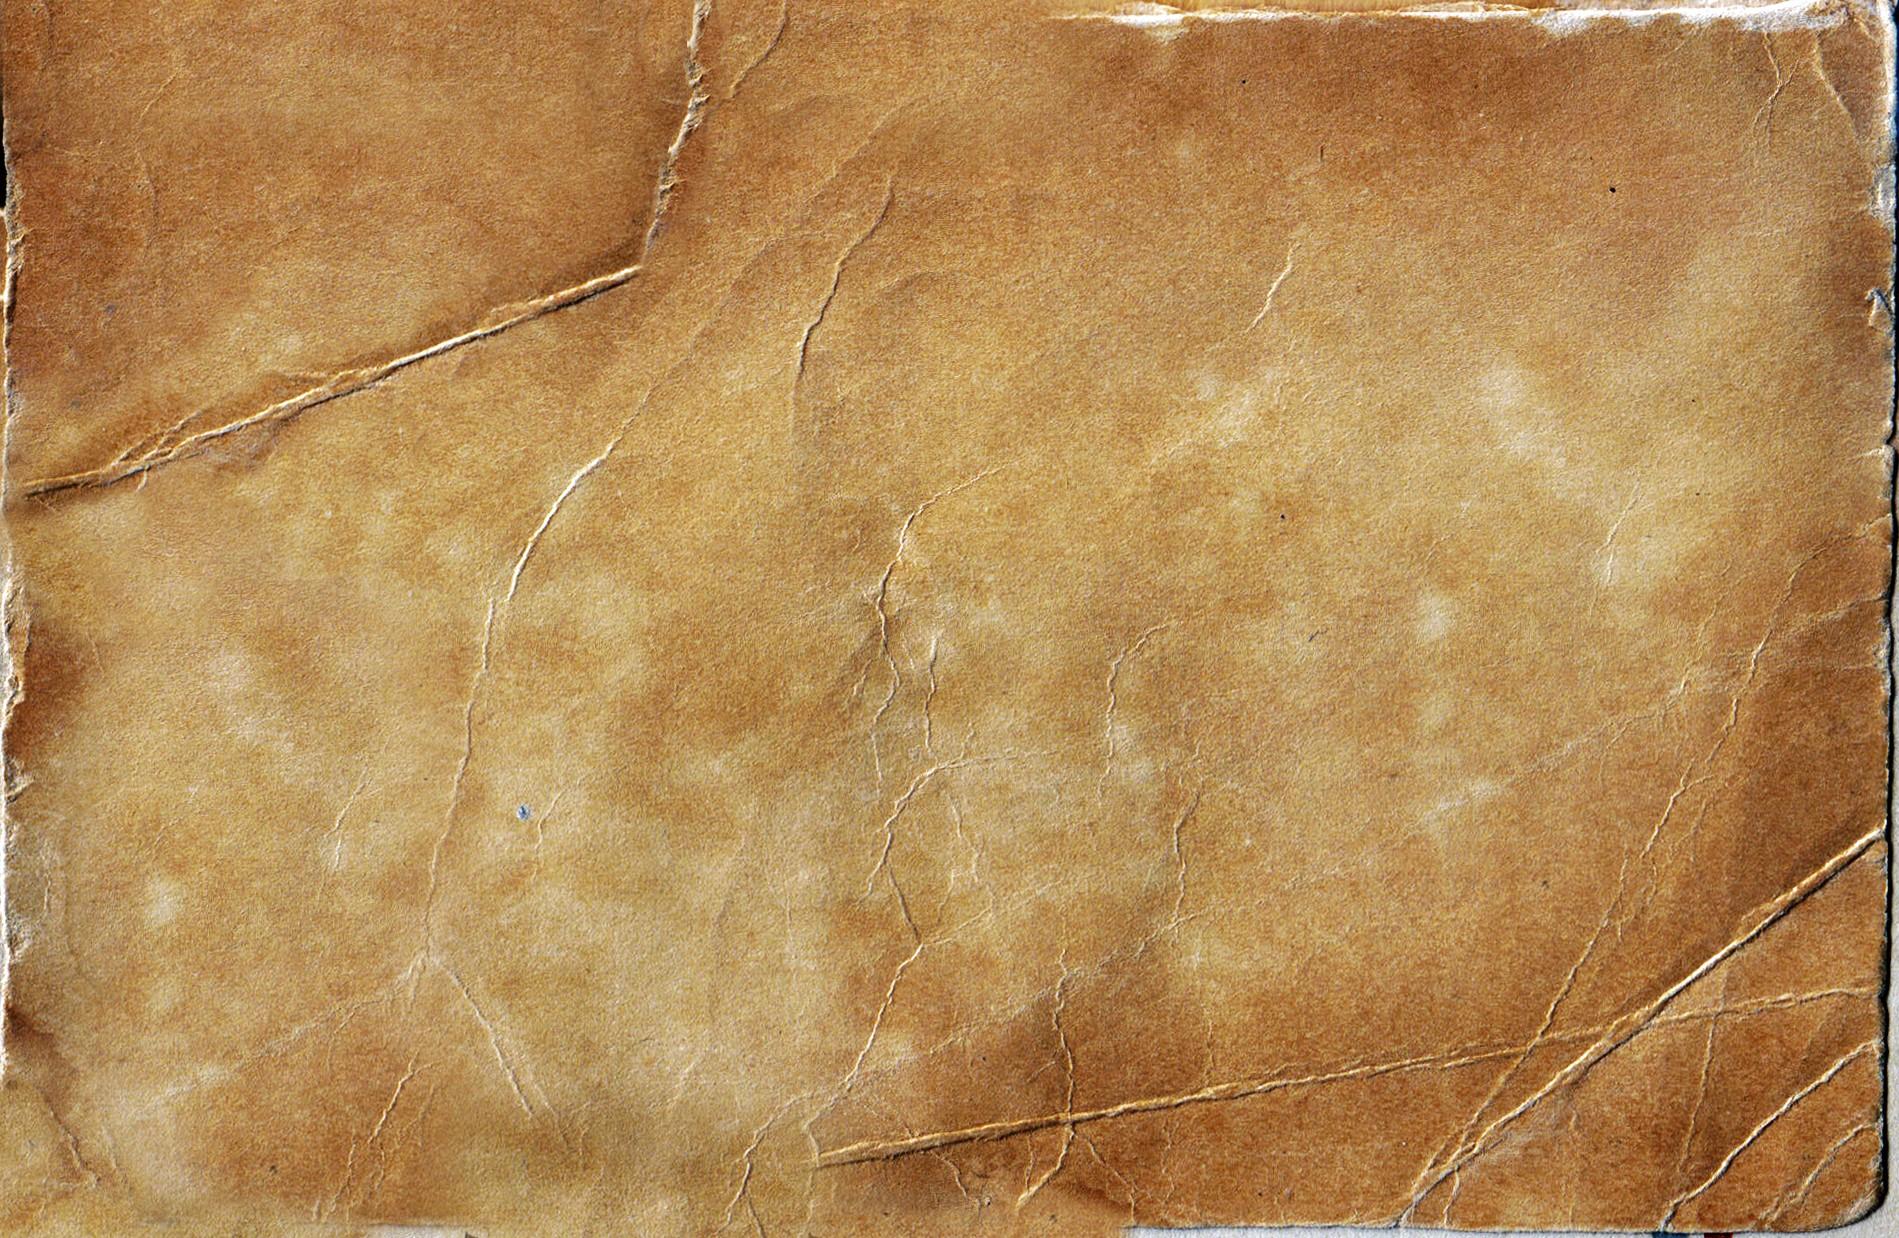 Paper Grunge Background Six | Photo Texture & Background